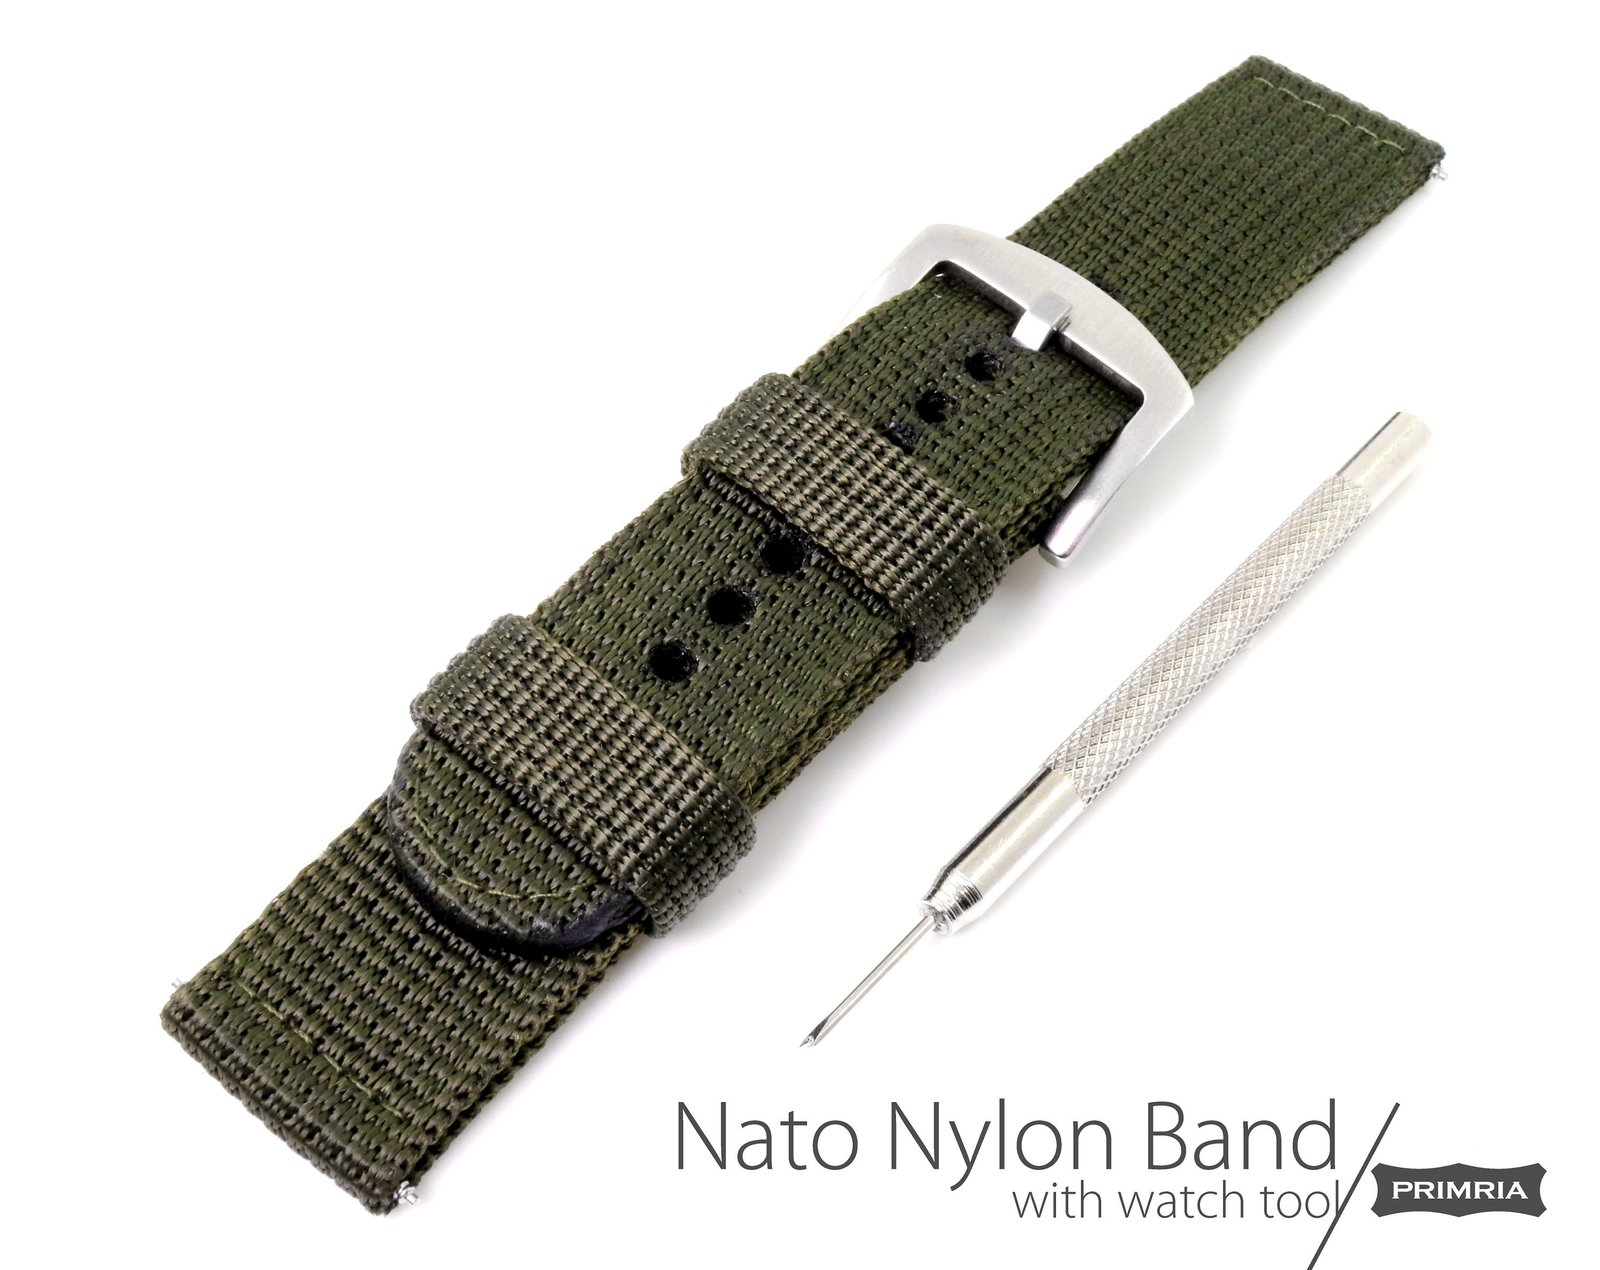 Triple layer 2-piece nylon G10 nato heavy duty watch straps - Army Green - $42.99